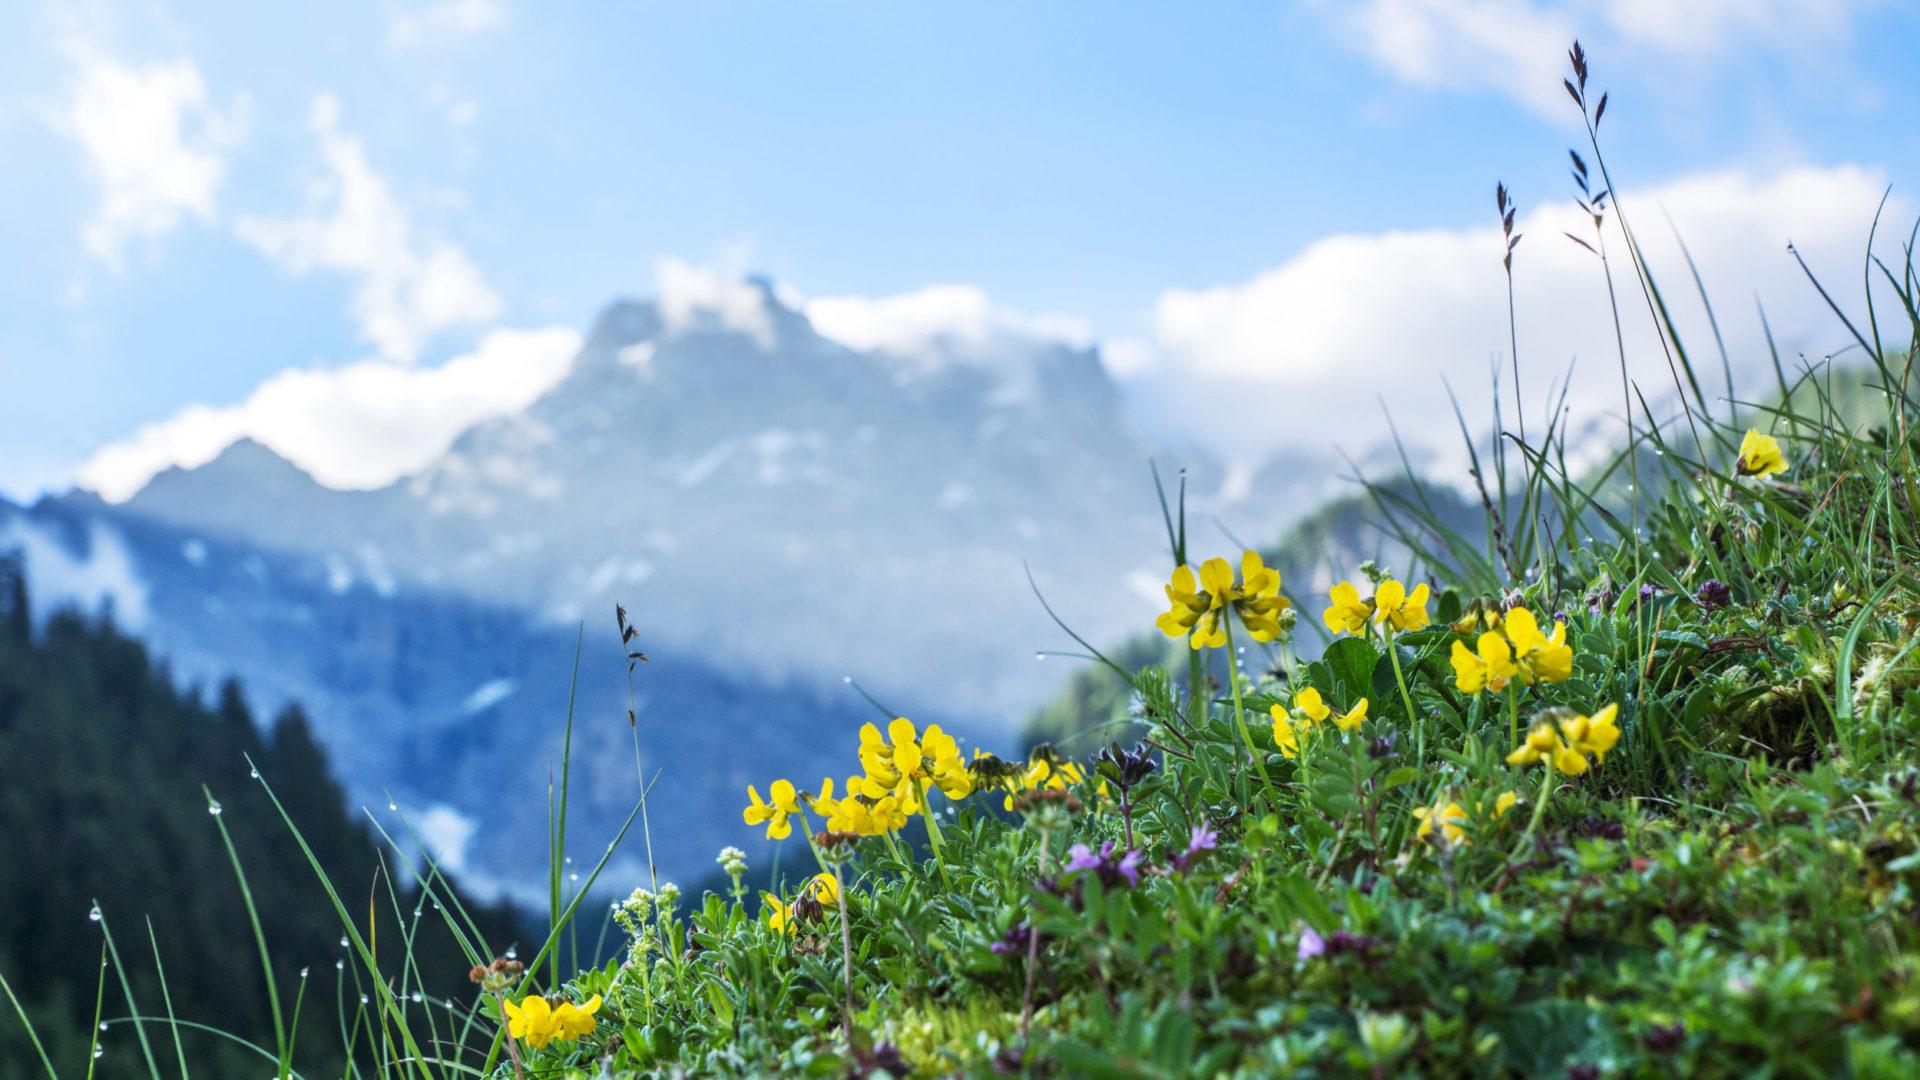 Blumenwiese mit Panuelerkopf © Helmut Düringer / Vorarlberg Tourismus